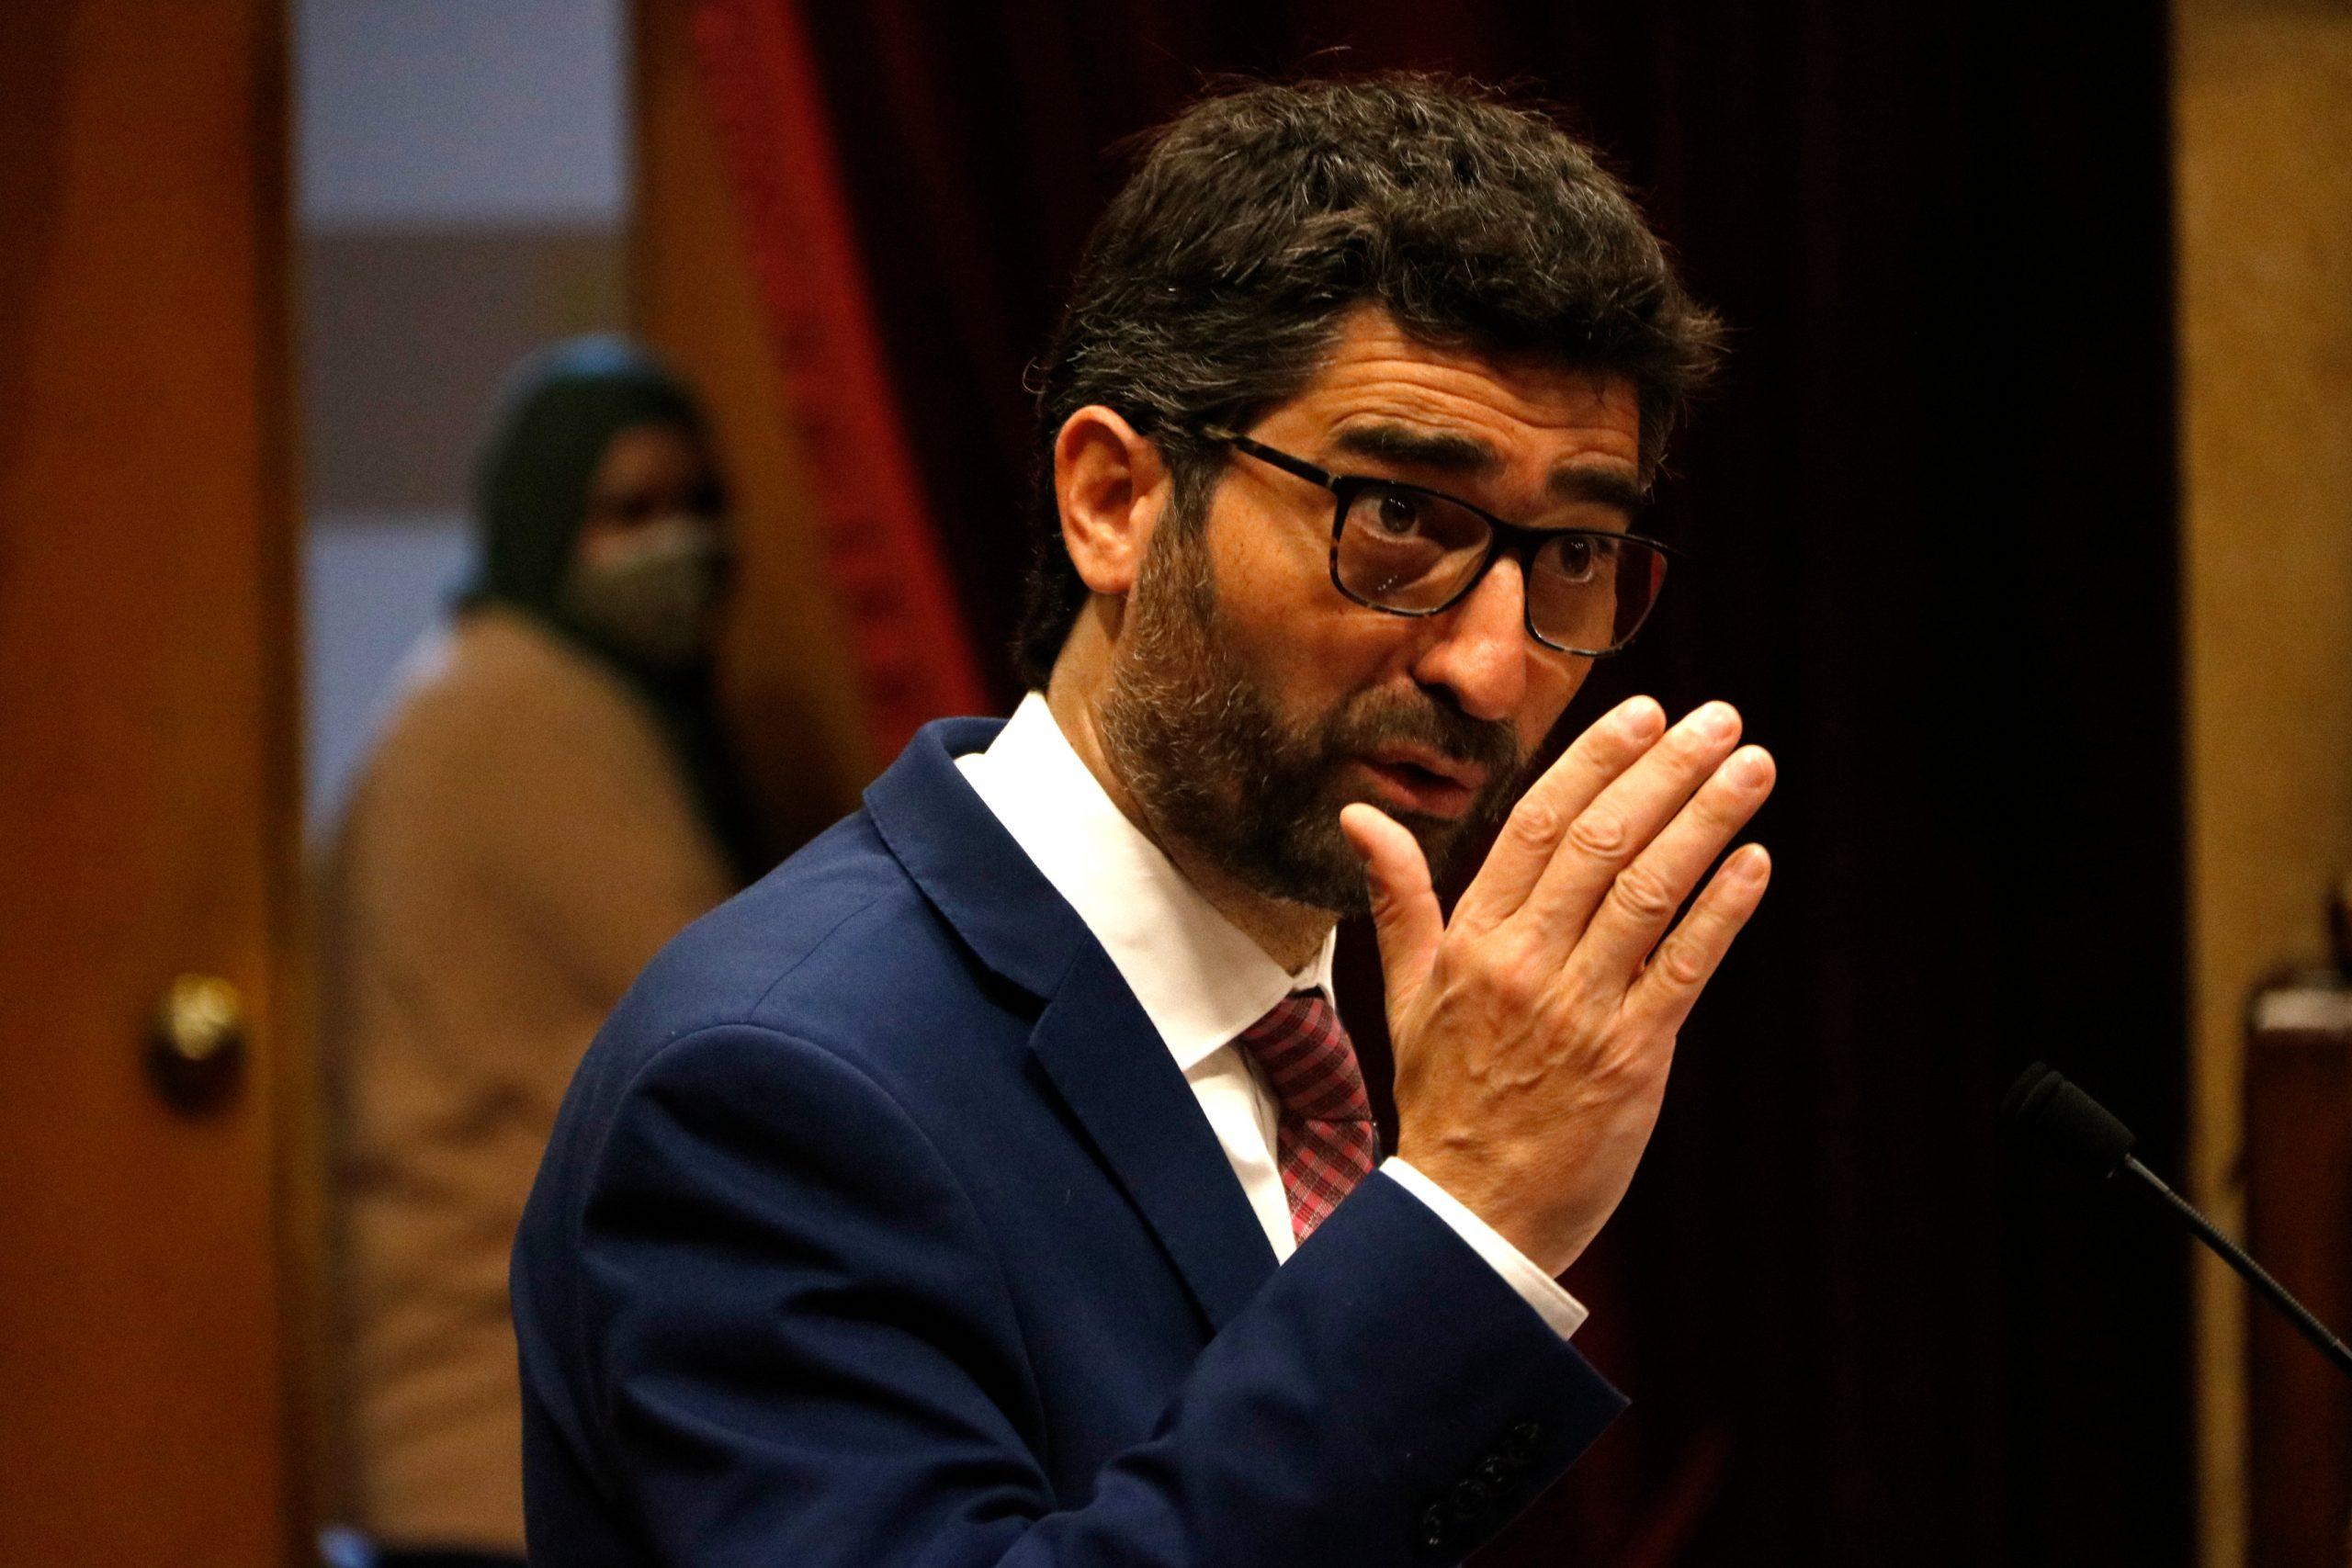 El vicepresident del Govern, Jordi Puigneró | ACN